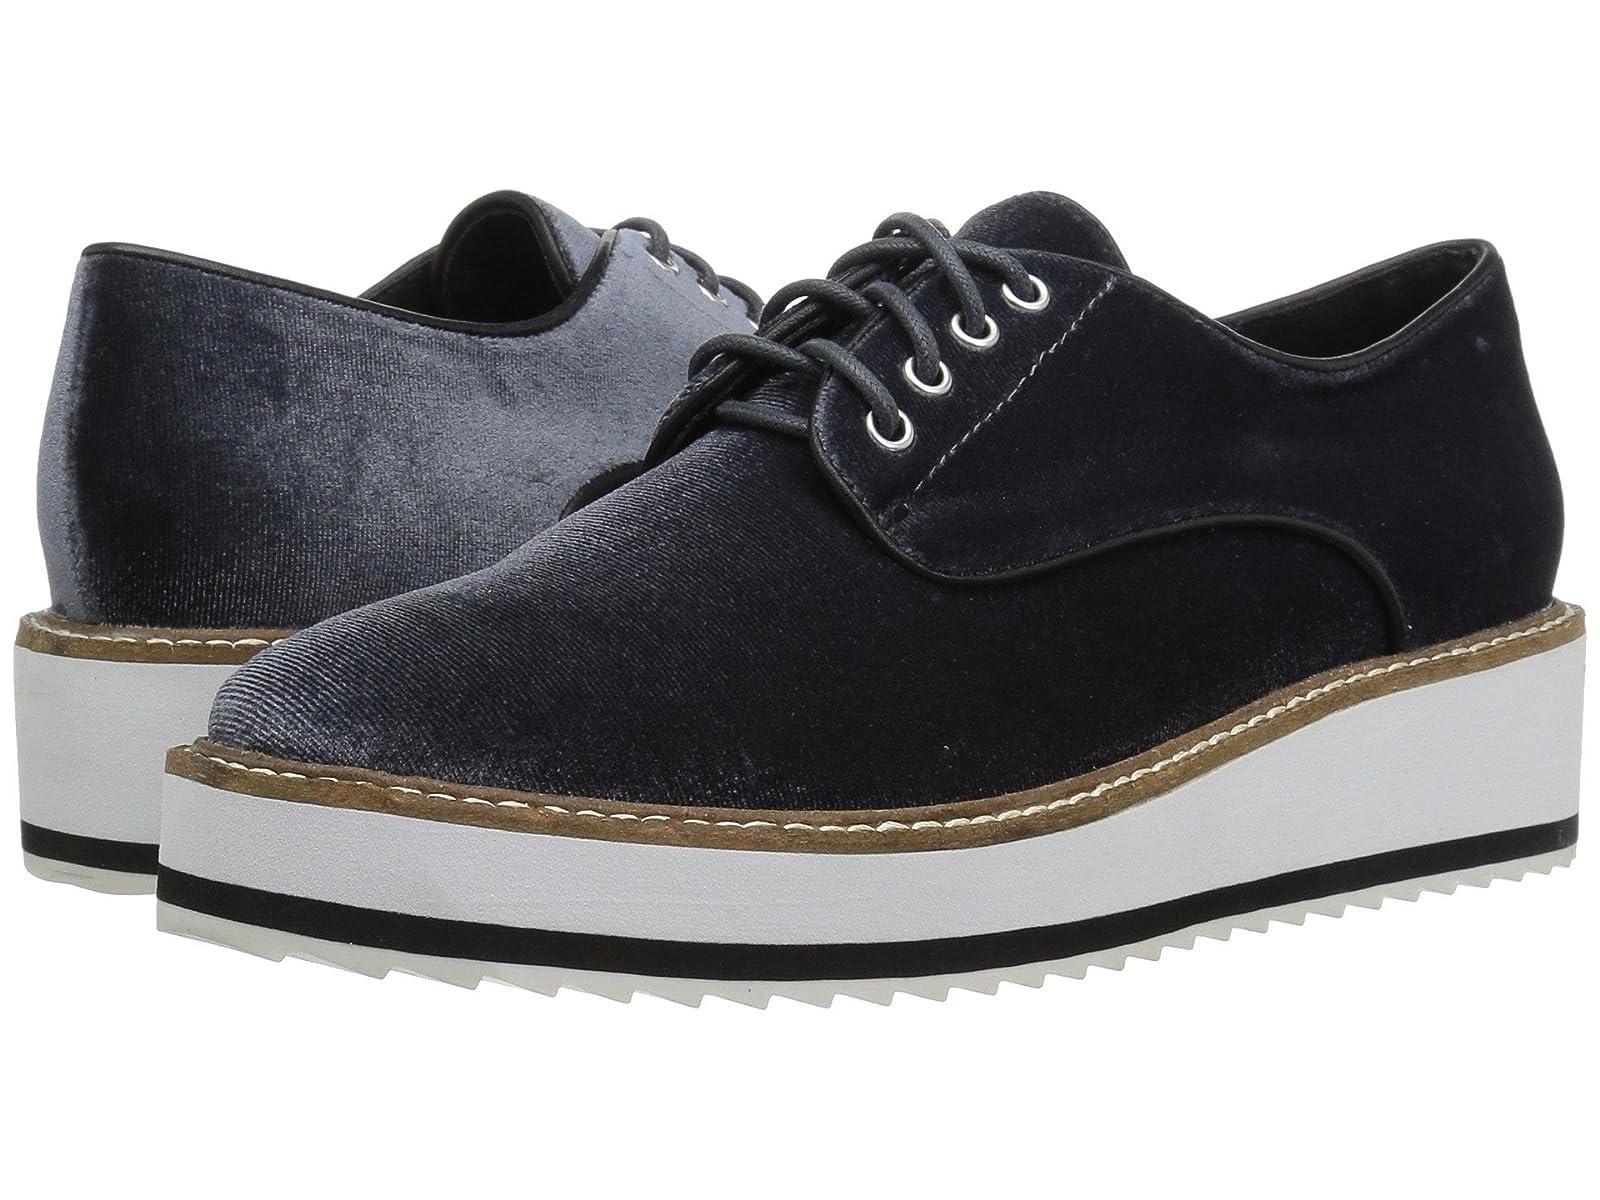 Shellys London Fontain platform oxfordCheap and distinctive eye-catching shoes